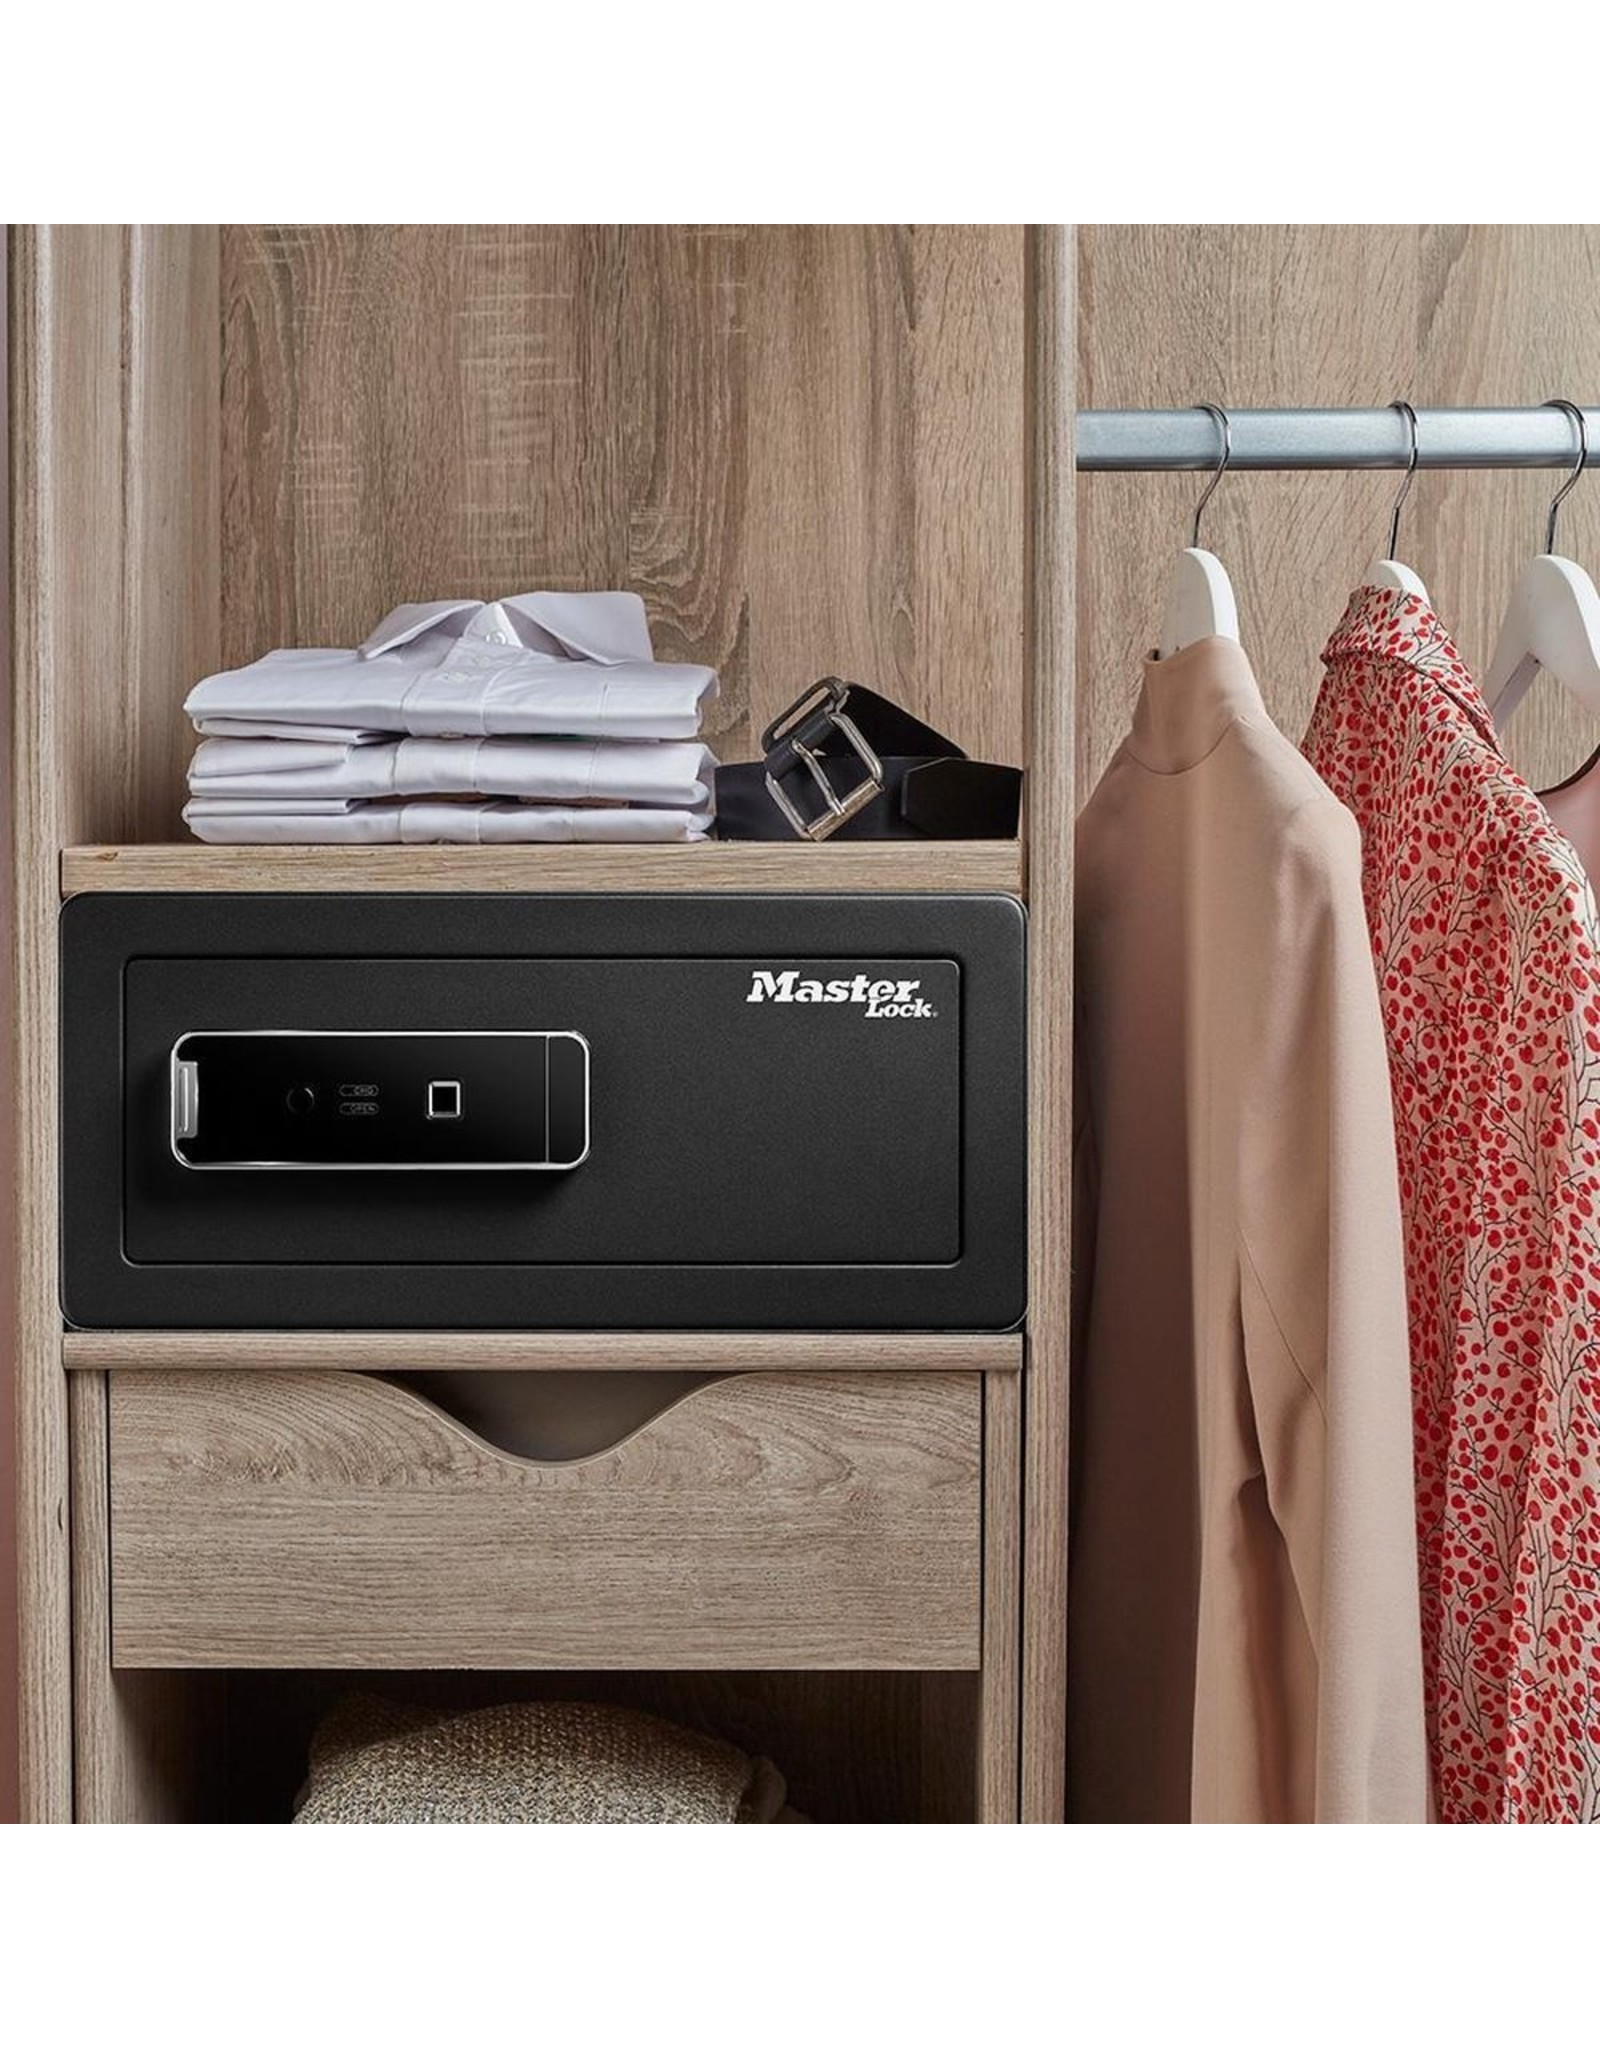 Masterlock - Biometric Safe -  With interior lighting